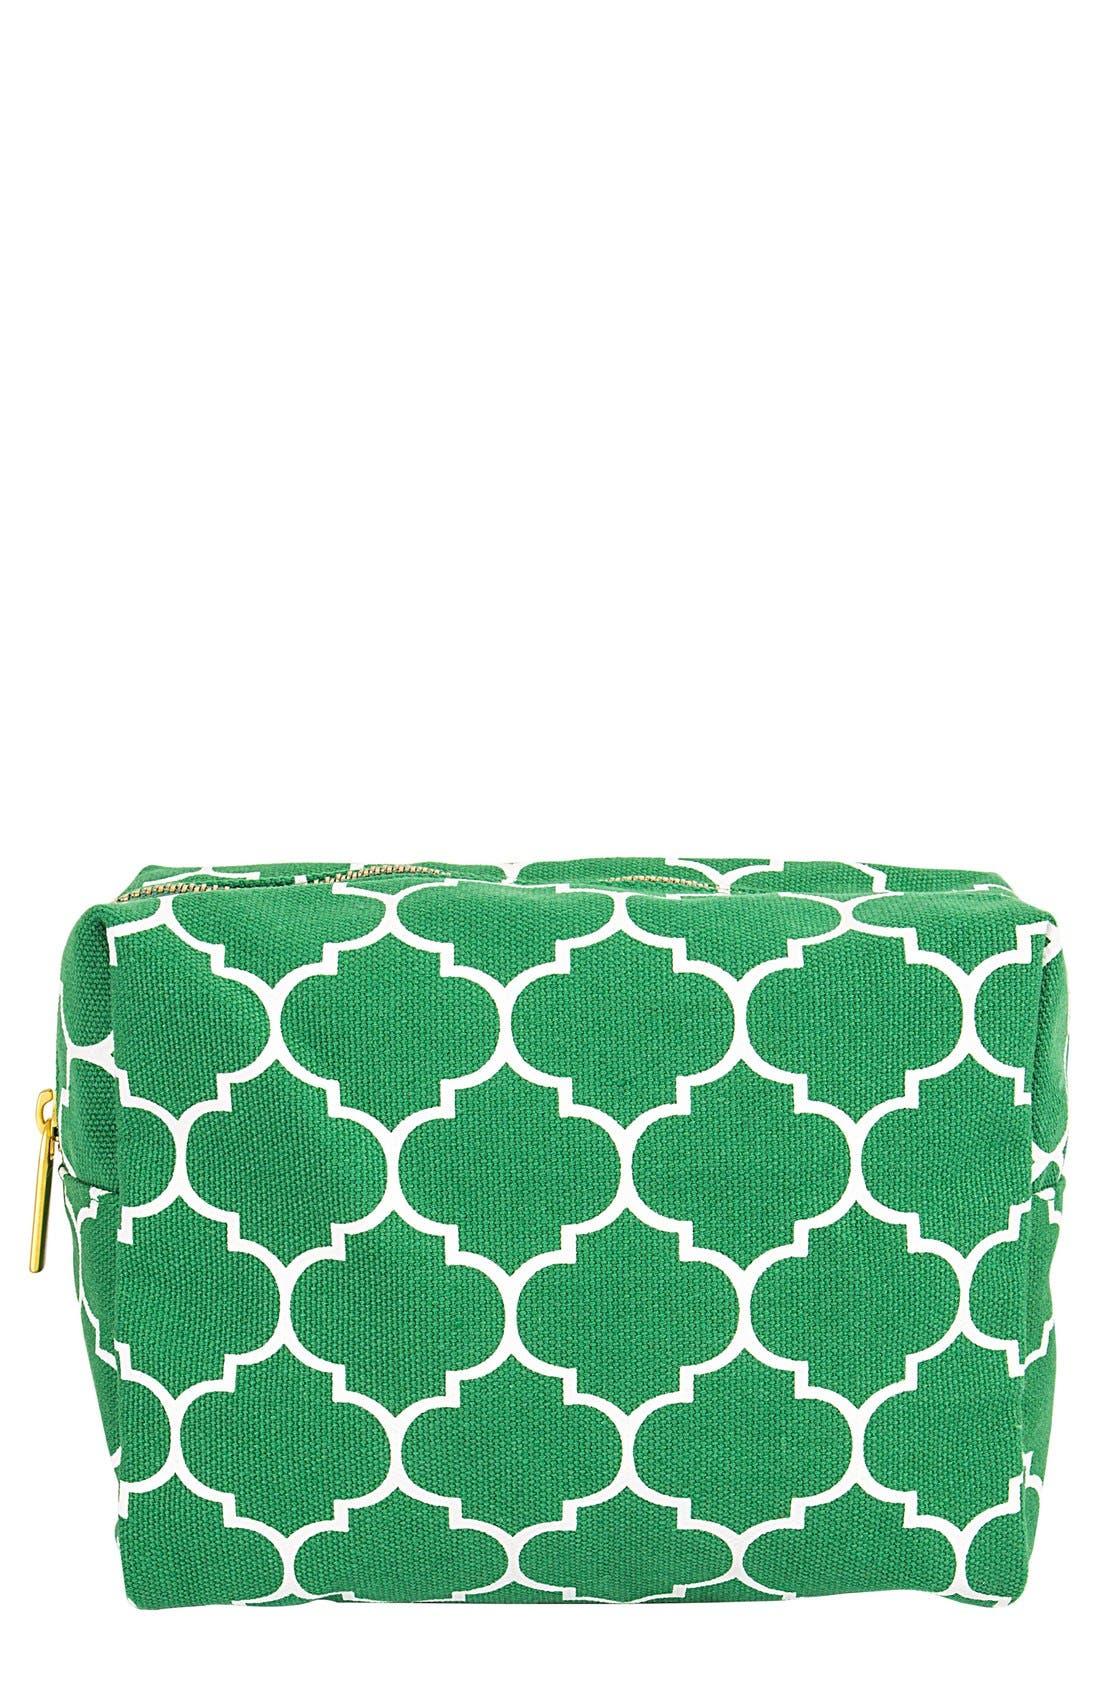 Monogram Cosmetics Bag,                             Main thumbnail 1, color,                             GREEN